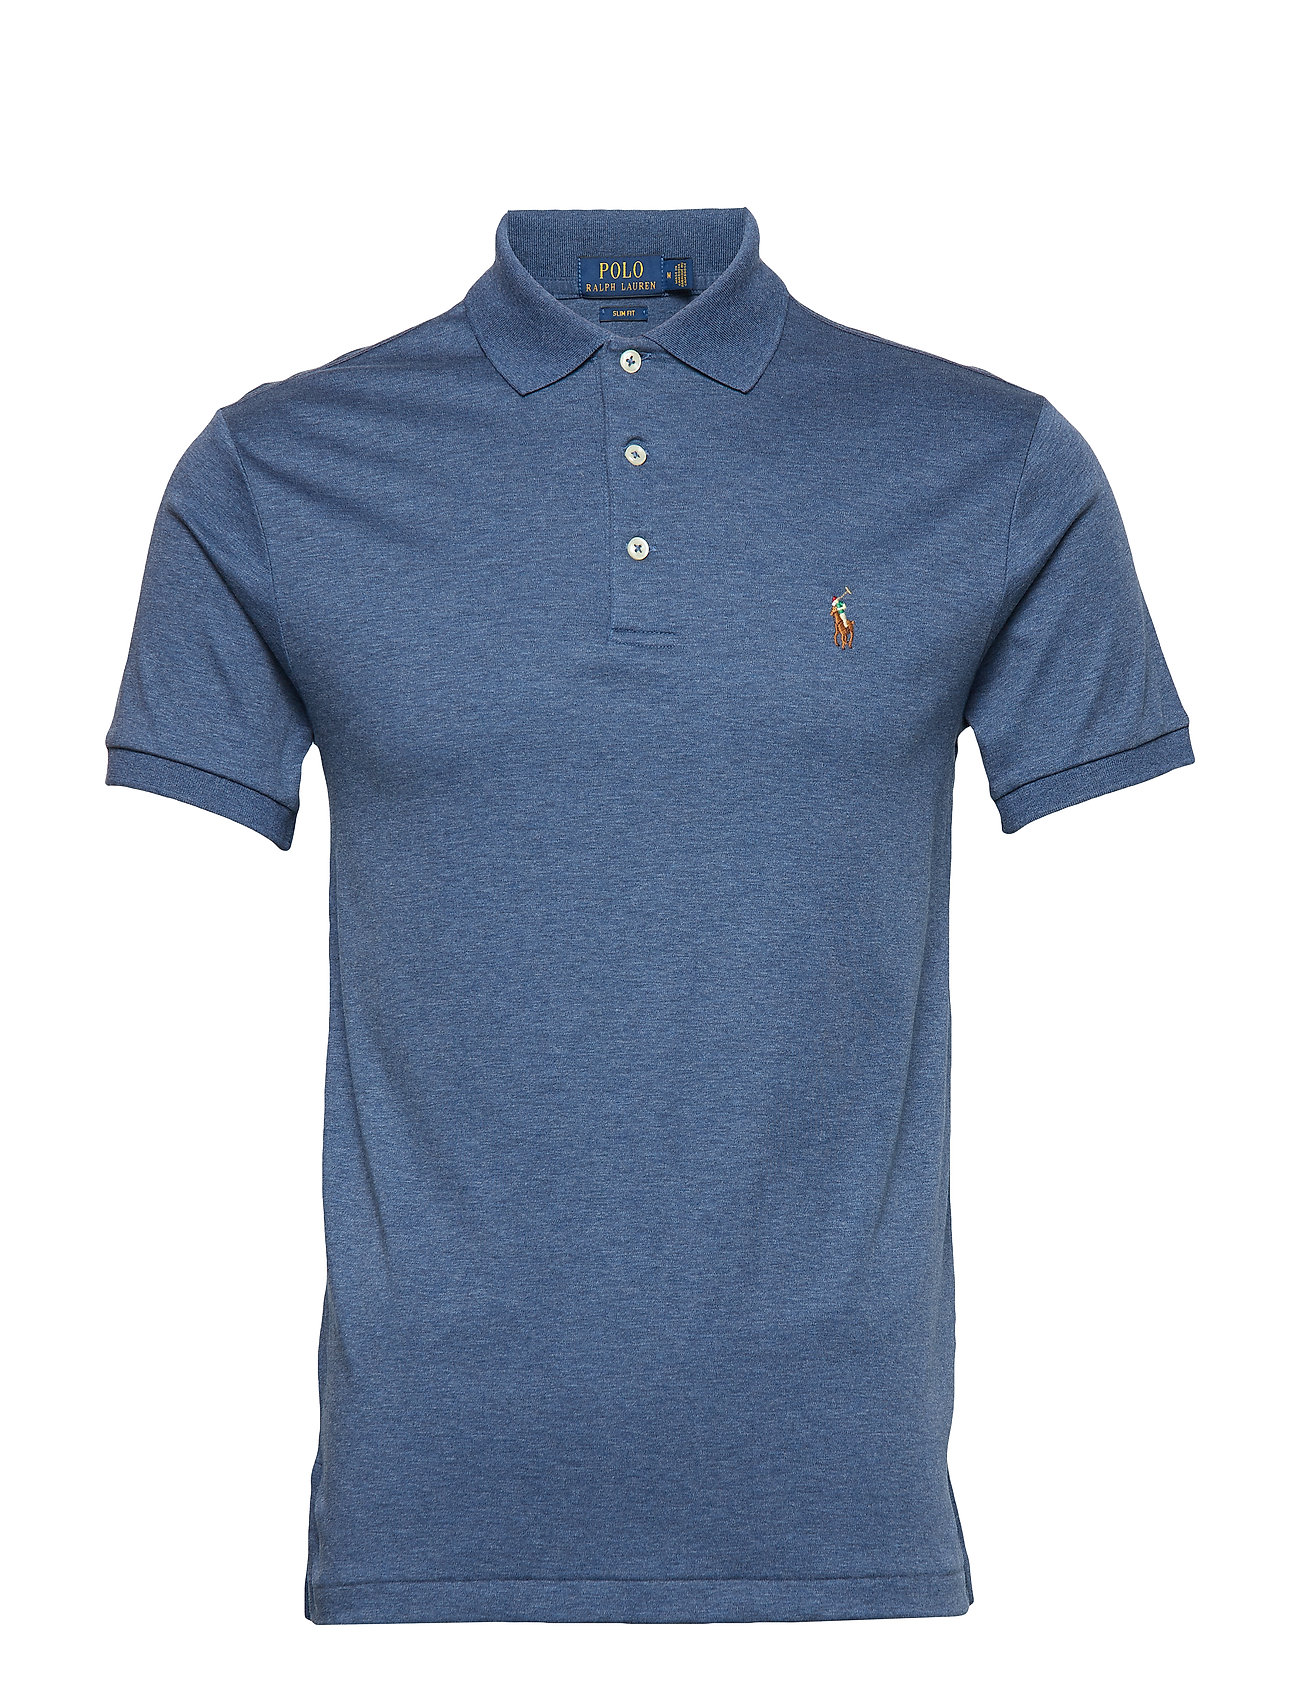 Polo Ralph Lauren Slim Fit Soft-Touch Polo Shirt - DERBY BLUE HEATHE